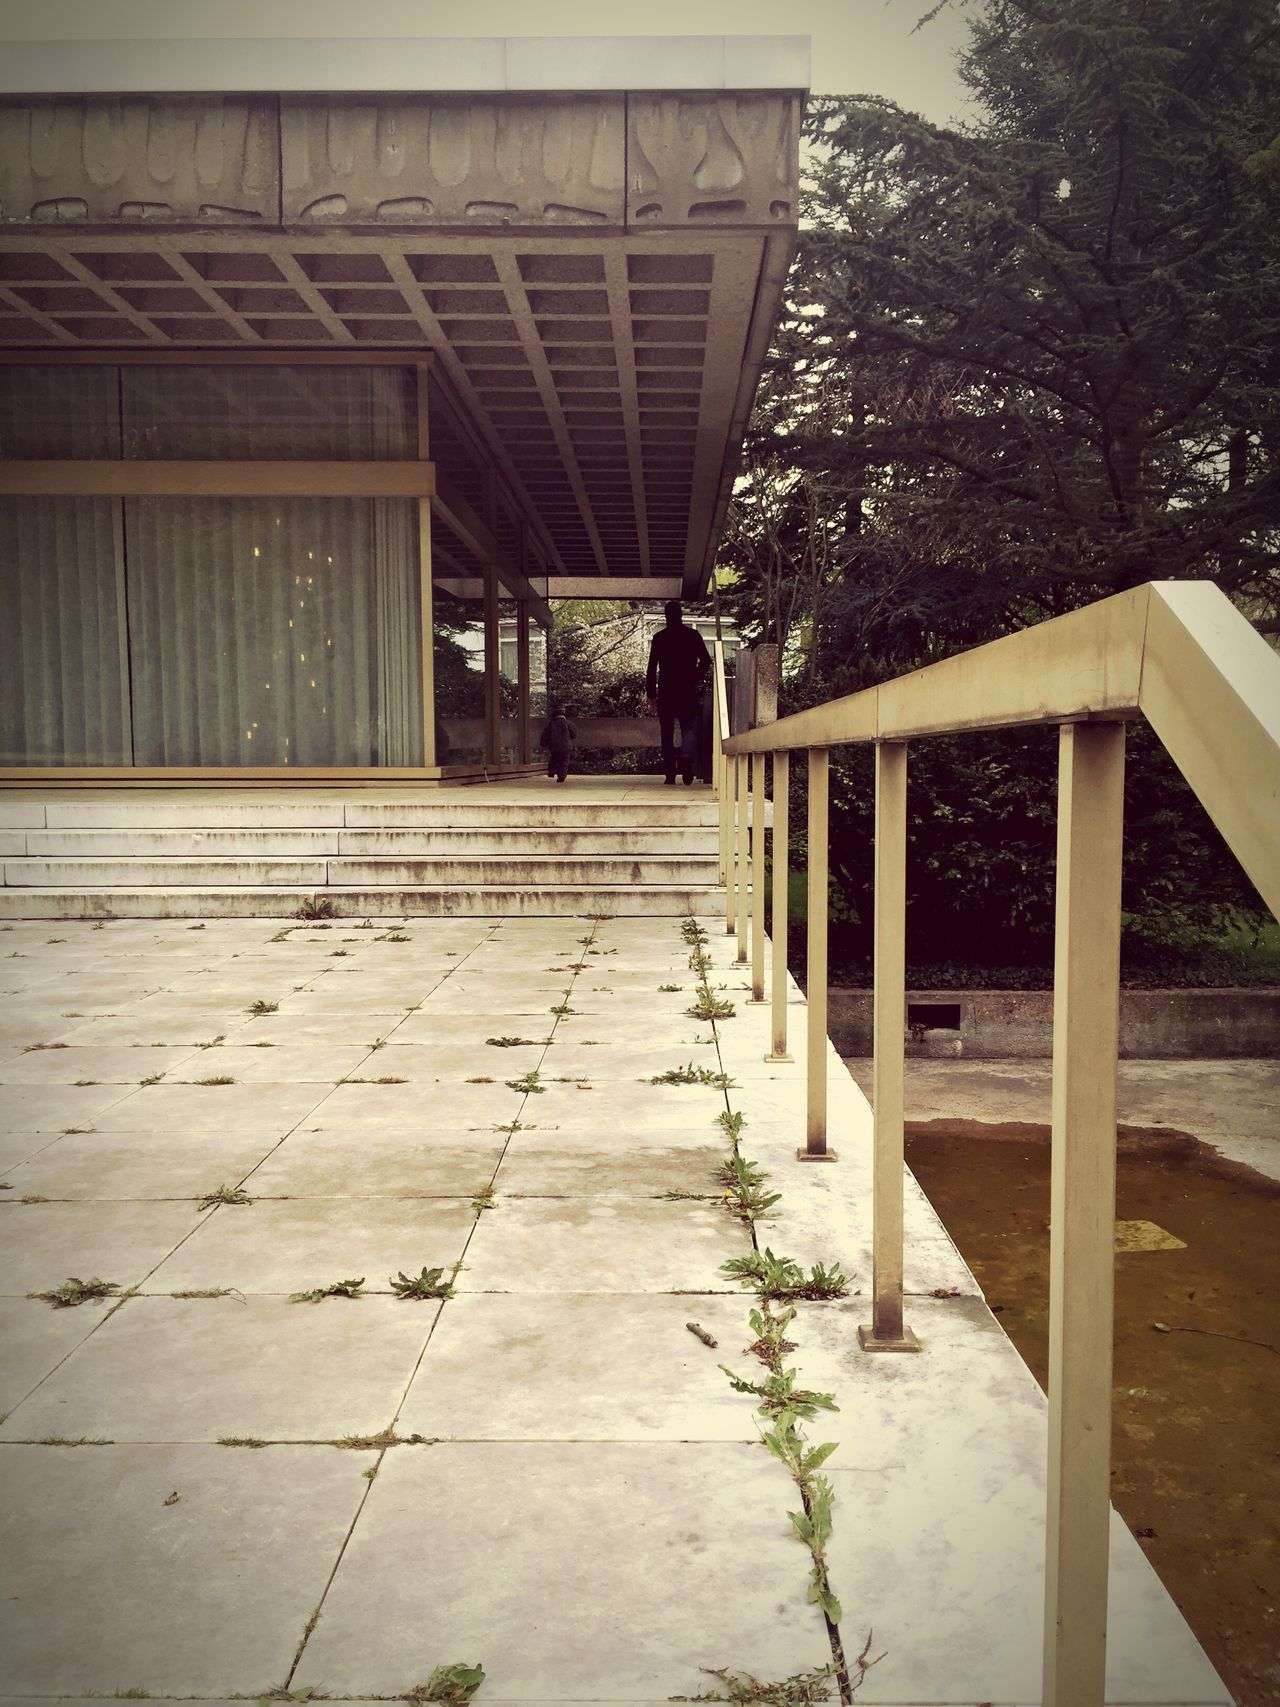 Decay in Bad Godesberg. Bonn Stadthalle Bad Godesberg Verfall Badgodesberg Decay Urban Treppe Stairs Daytime